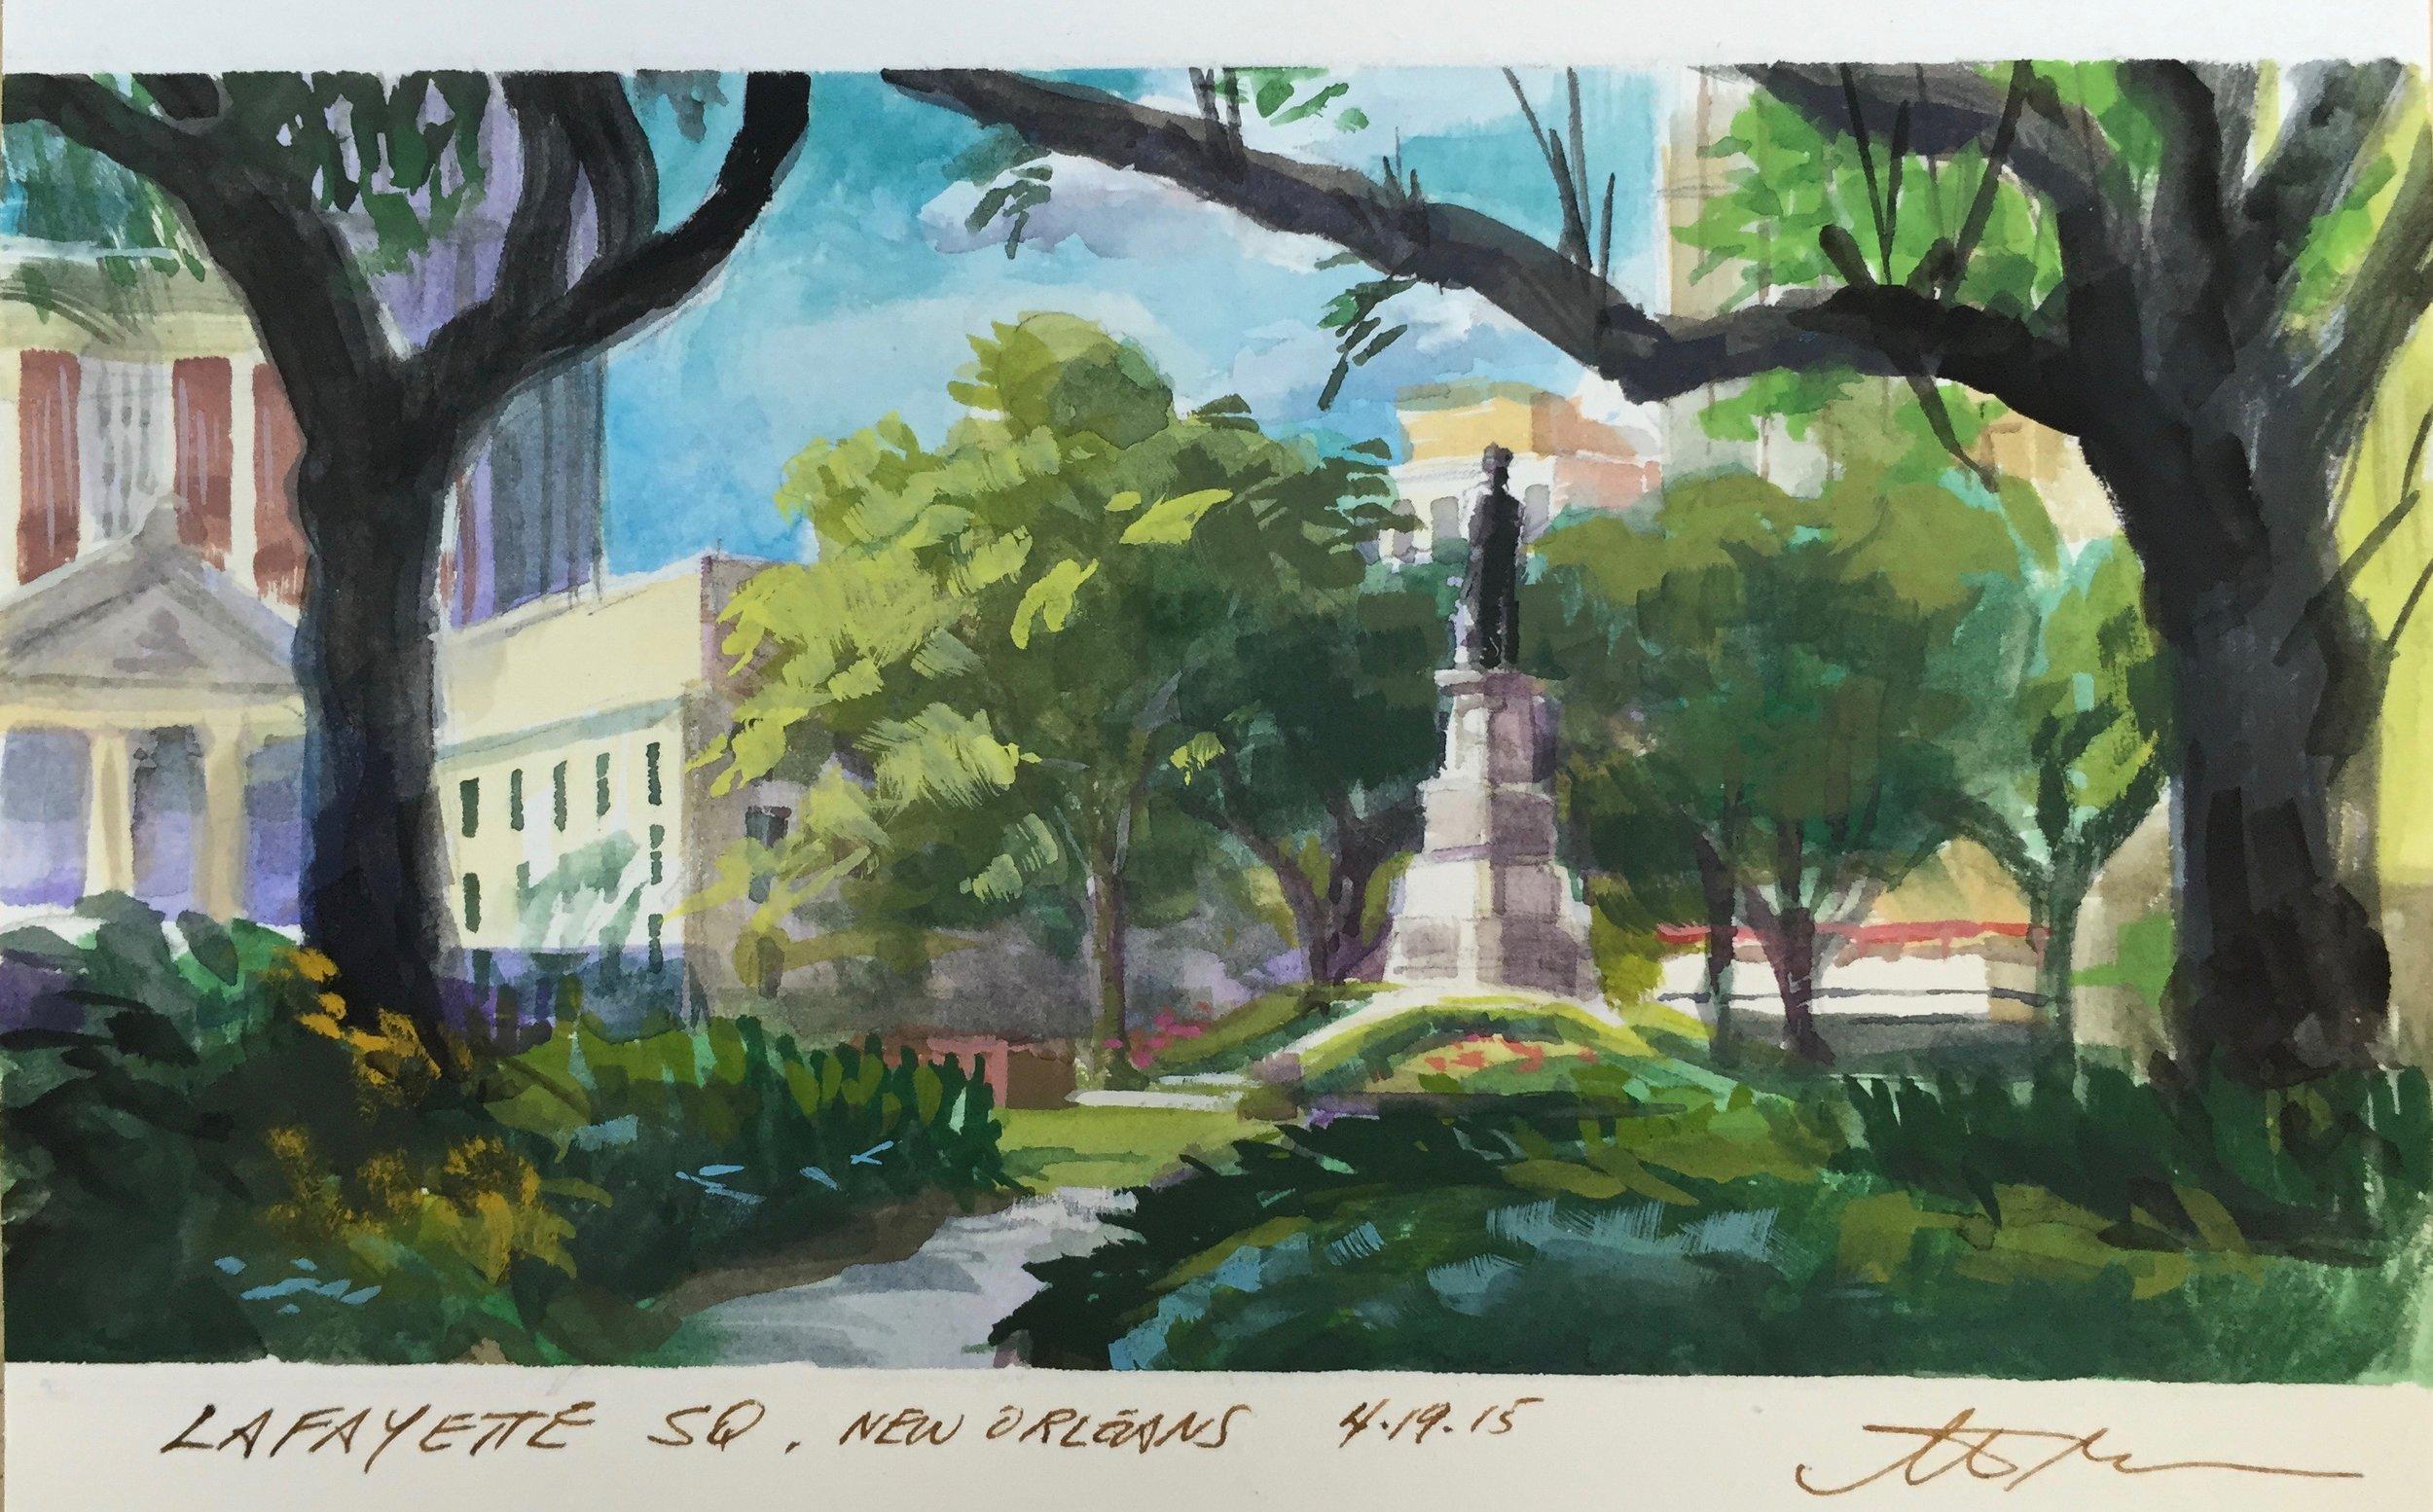 Lafayette Sq., New Orleans